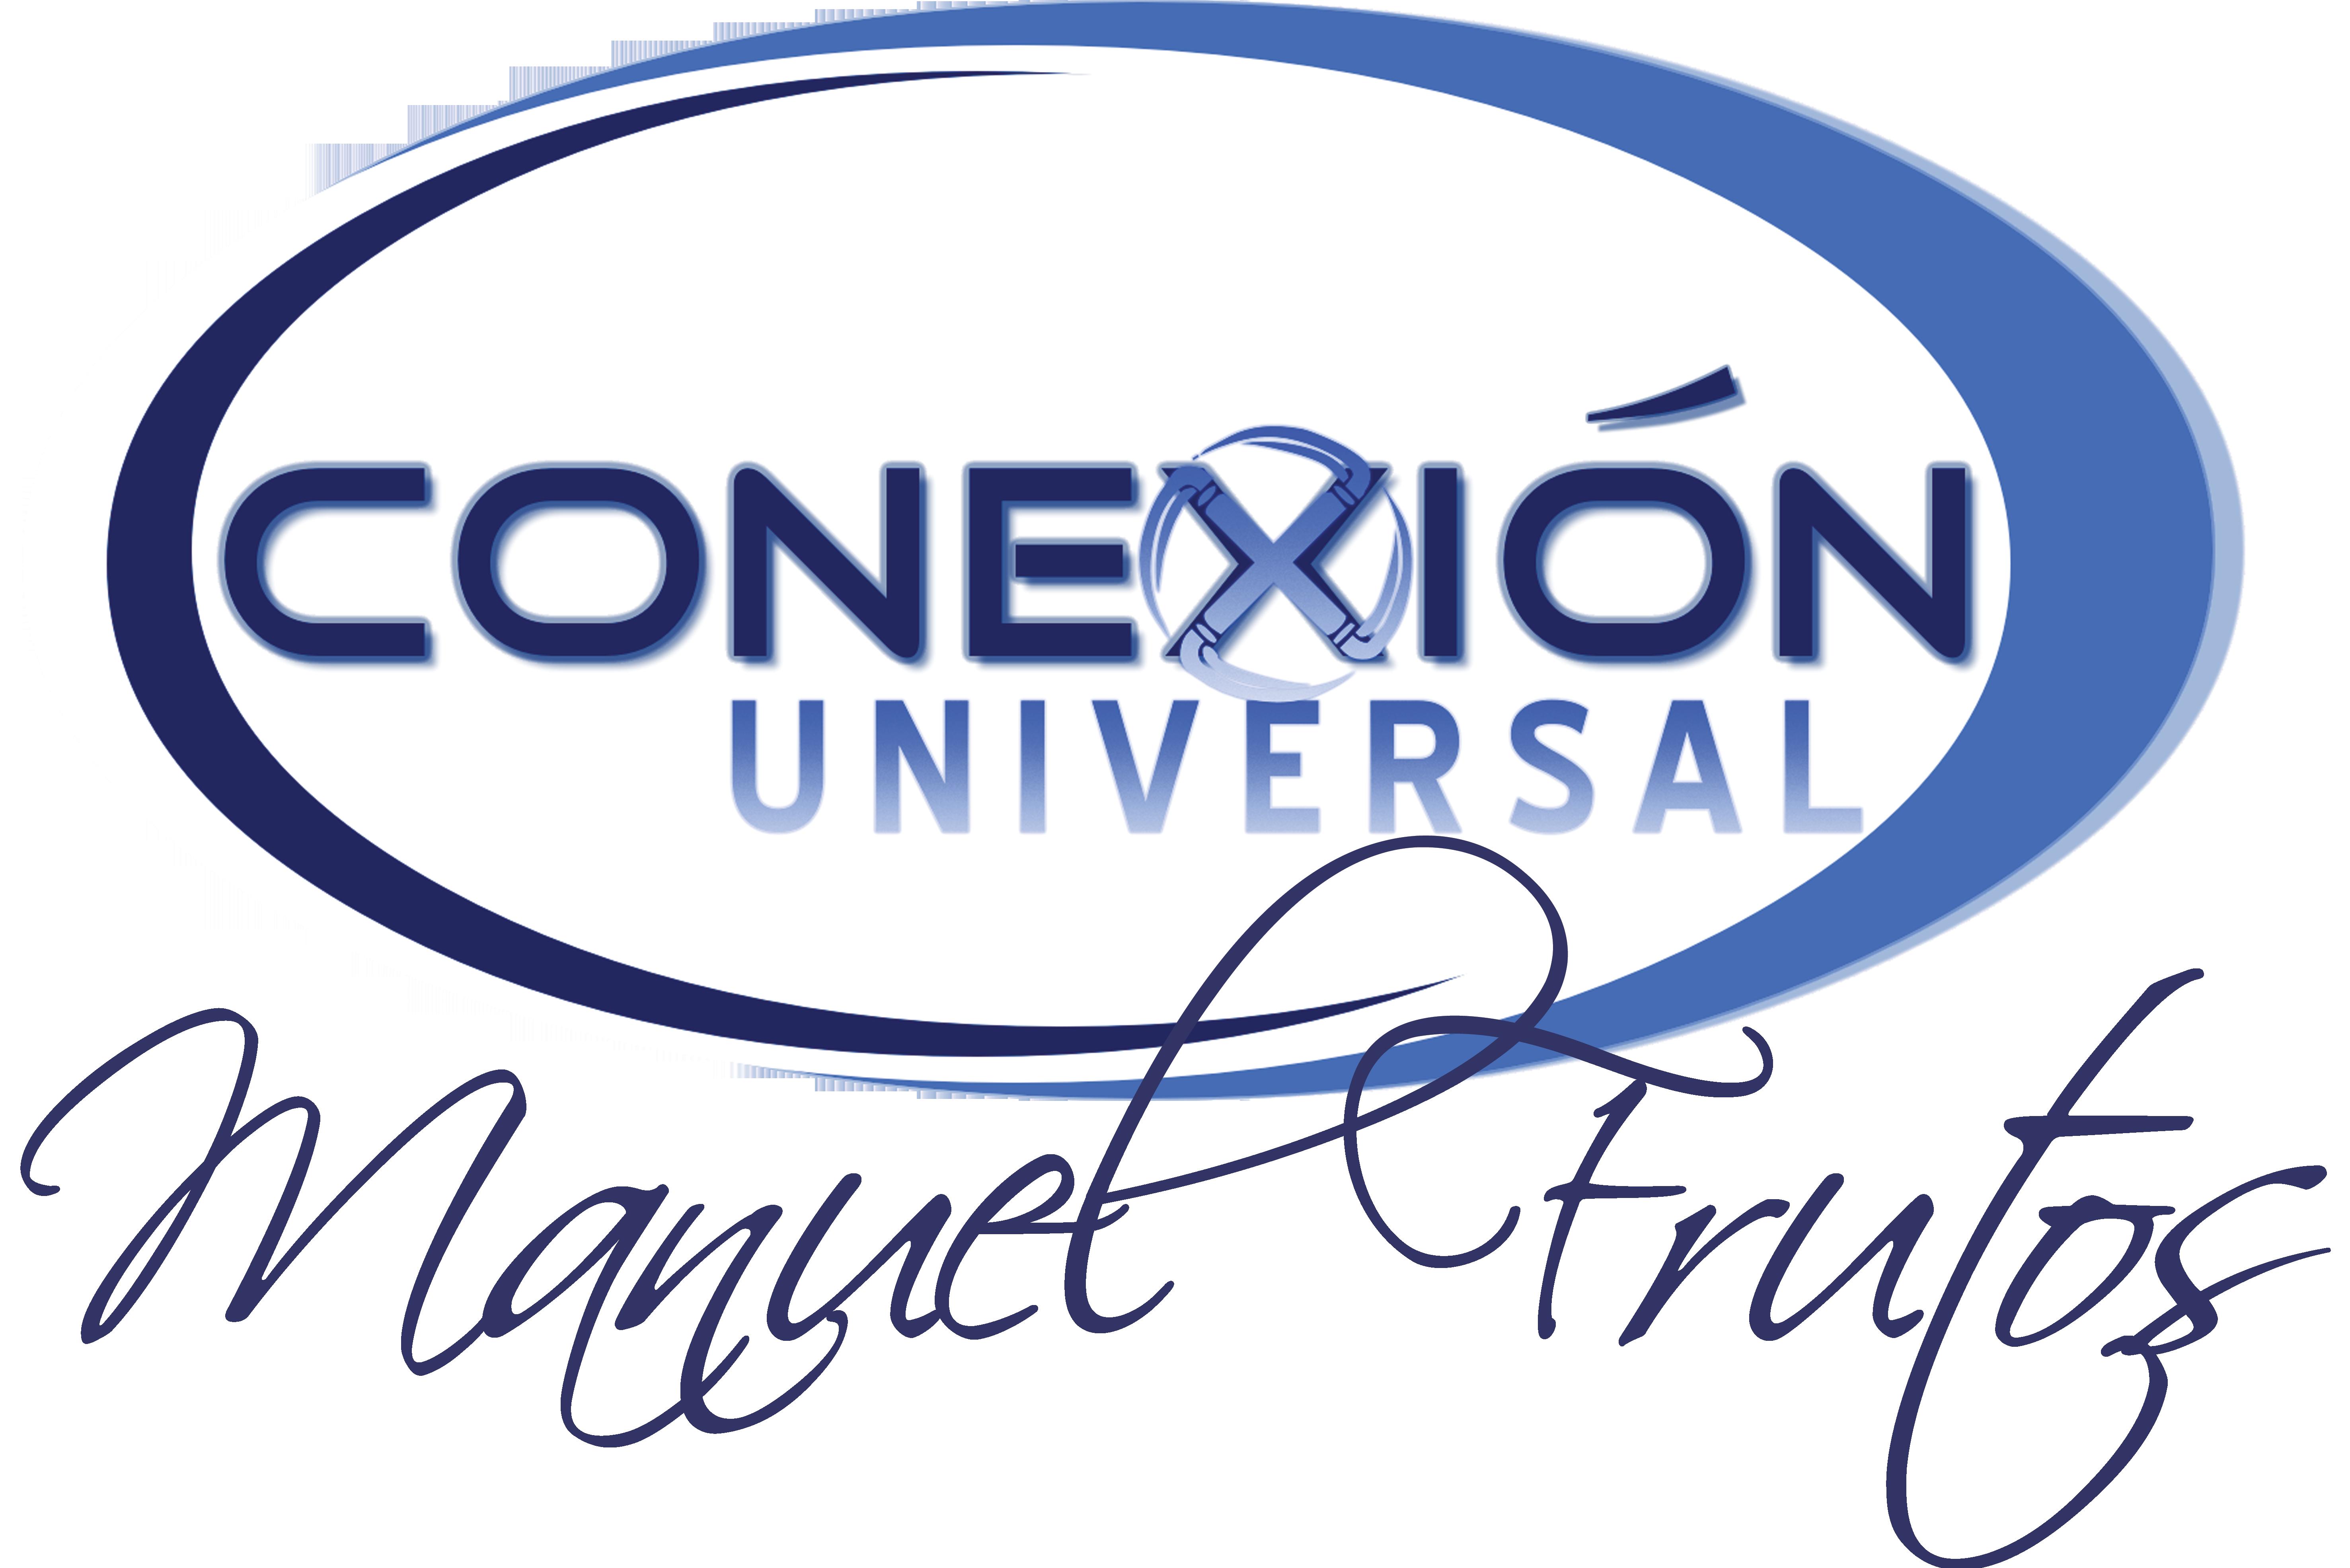 CONEXIONUNIVERSAL Logo